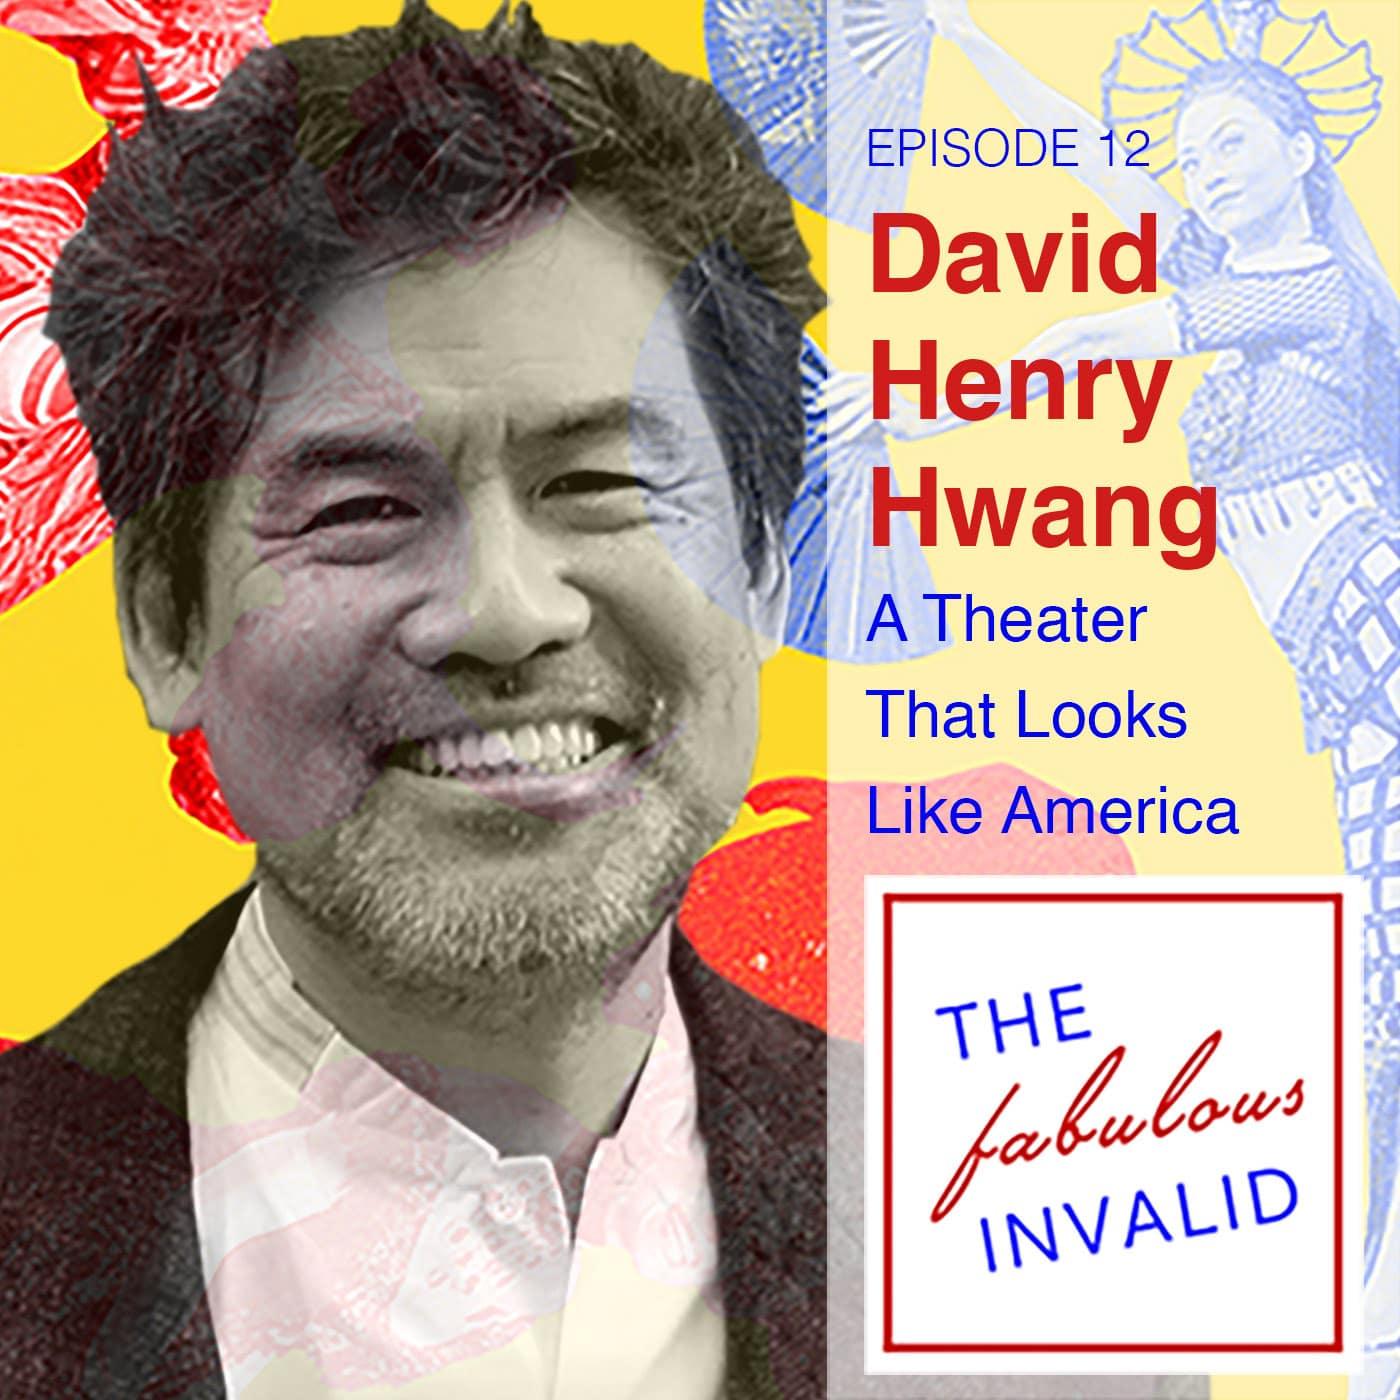 The Fabulous Invalid Ep 12 David Henry Hwang